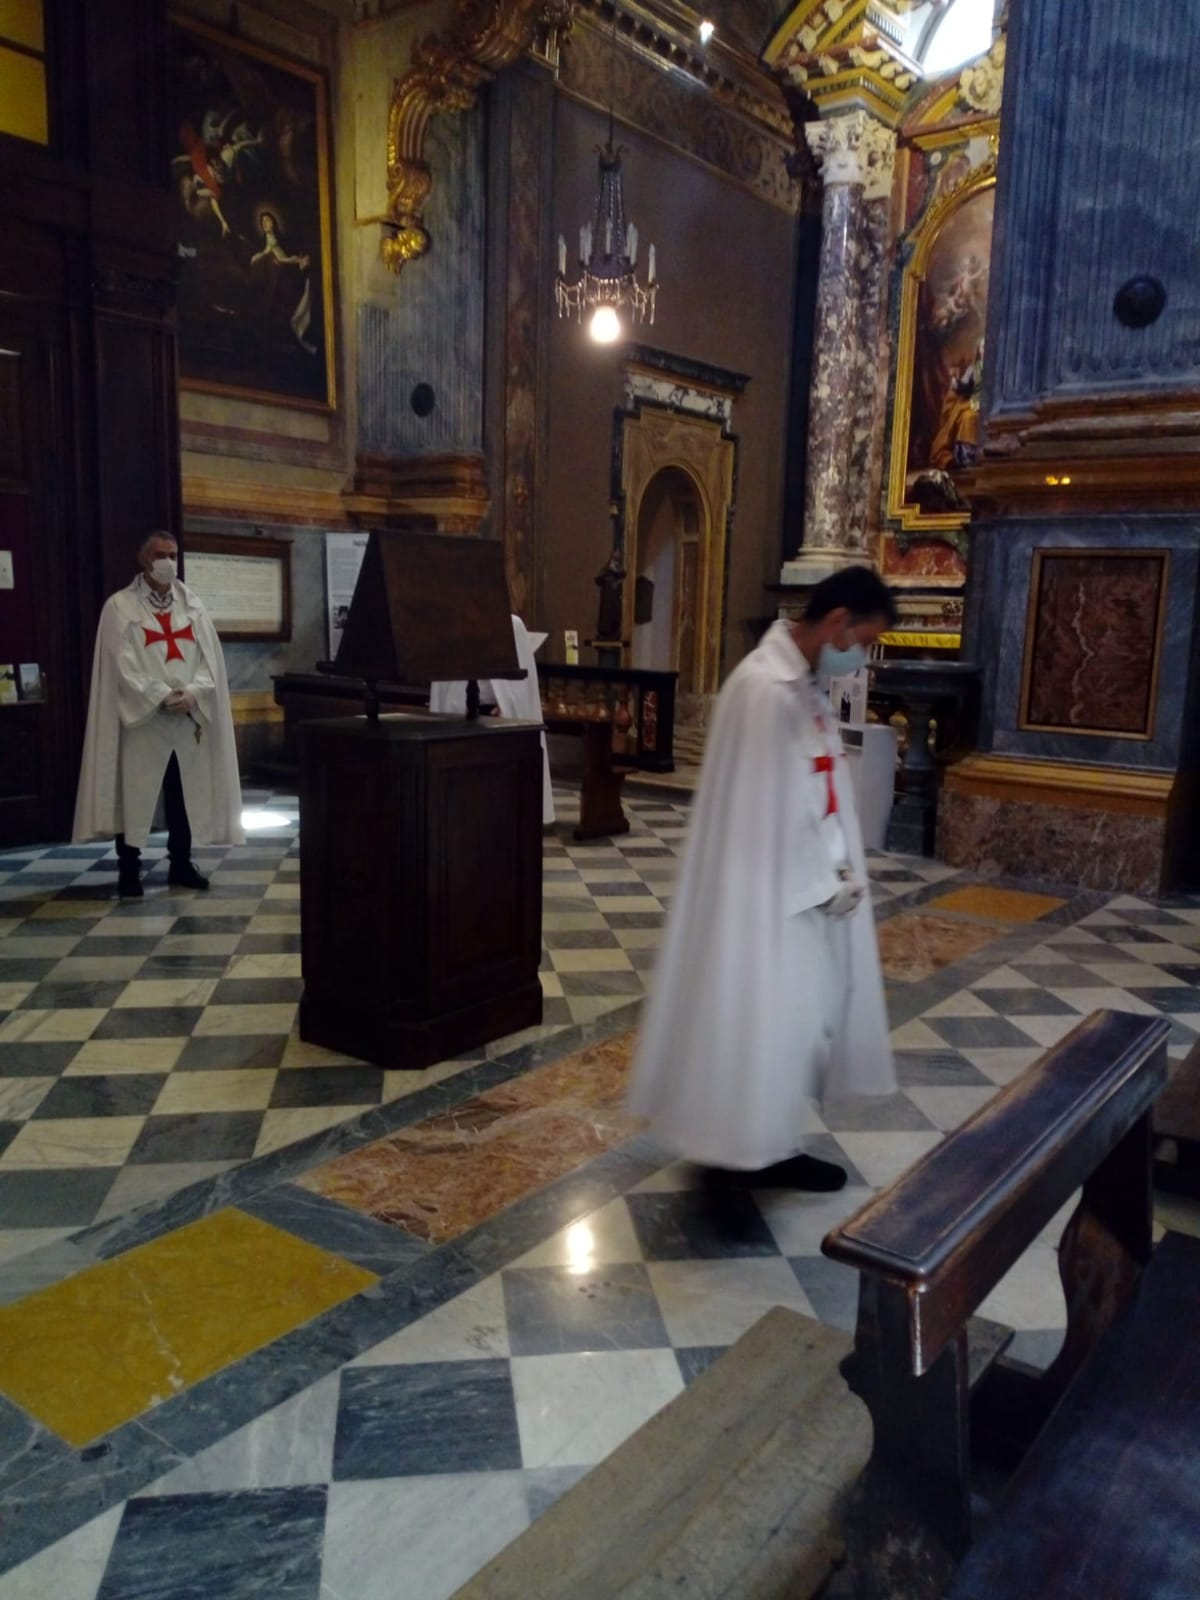 Fronleichnam in der Kirche Santa Teresa in Turin (Juni 2020)